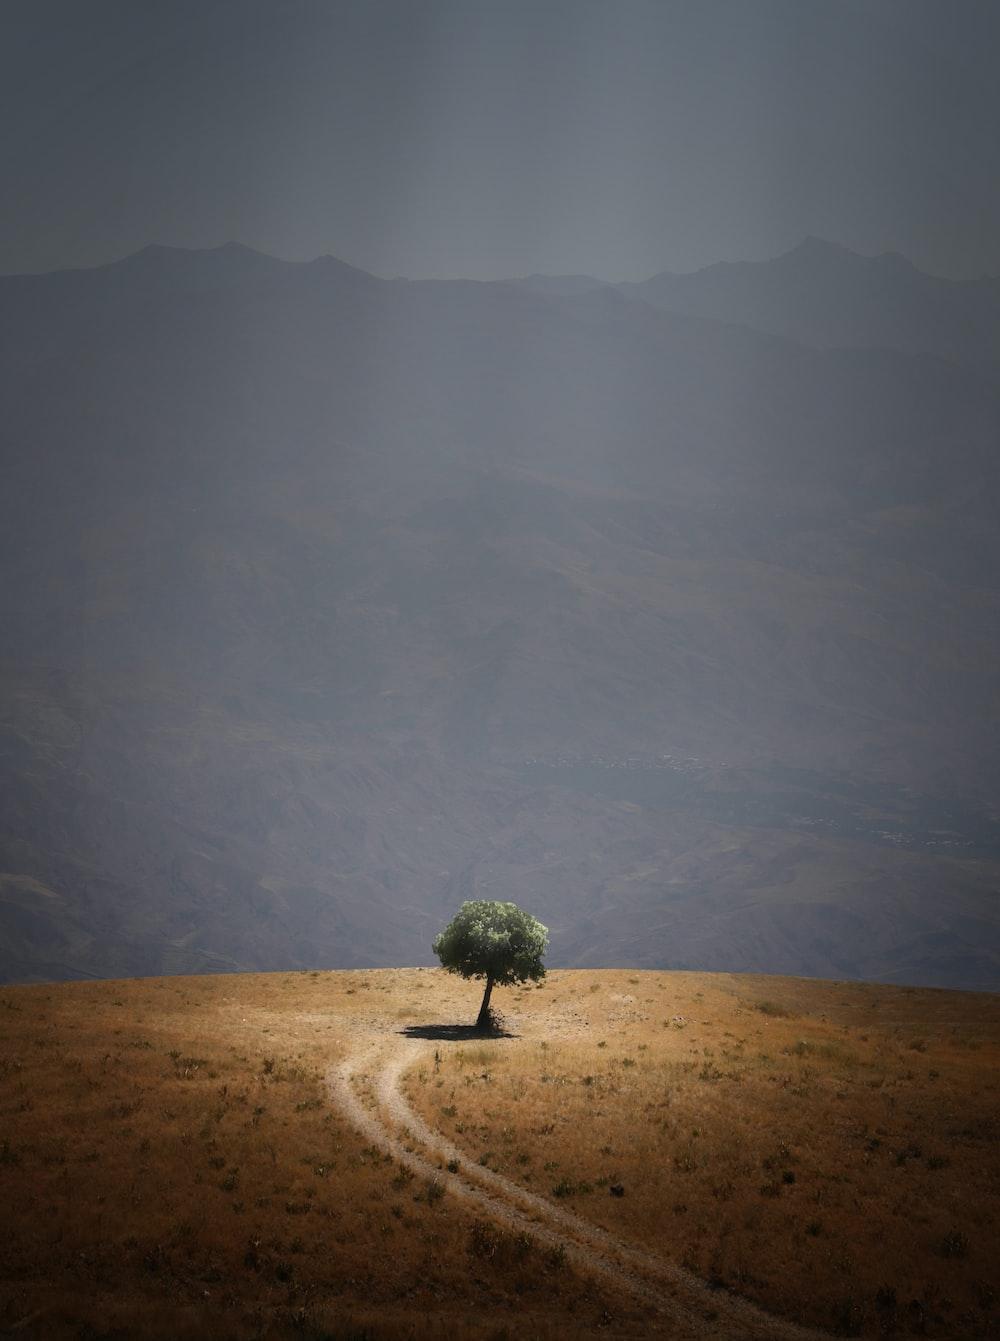 tree near pathway